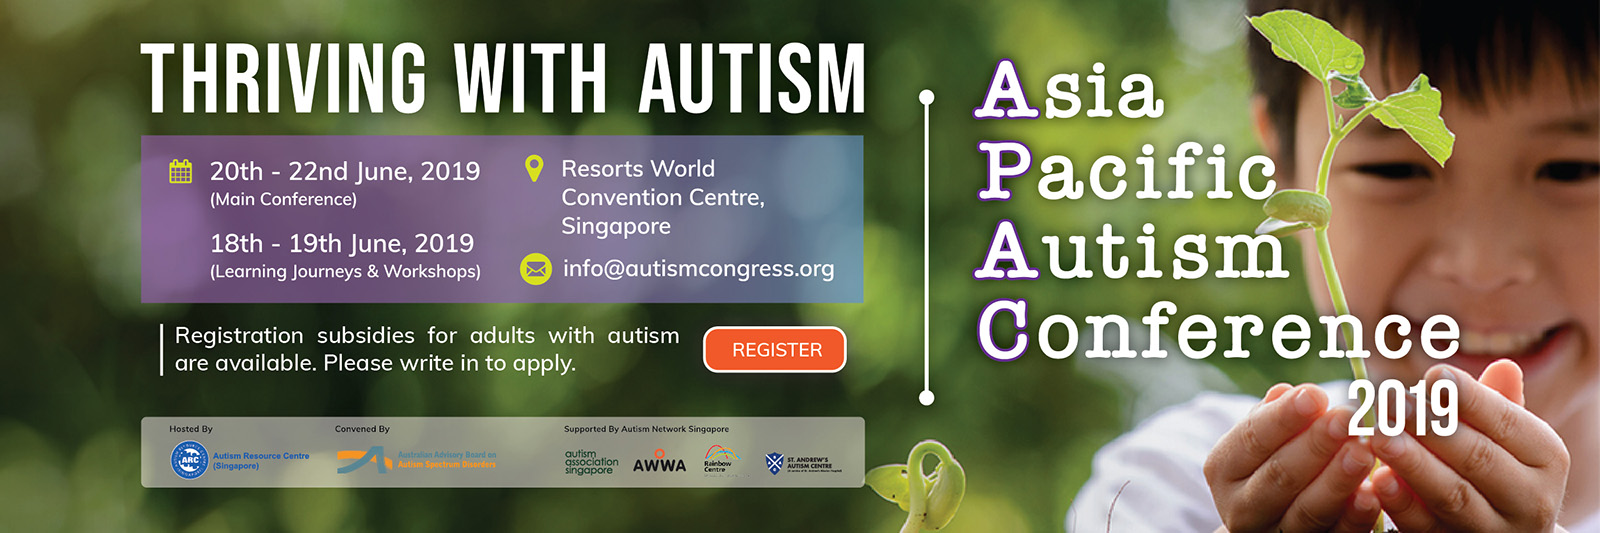 Register for APAC19